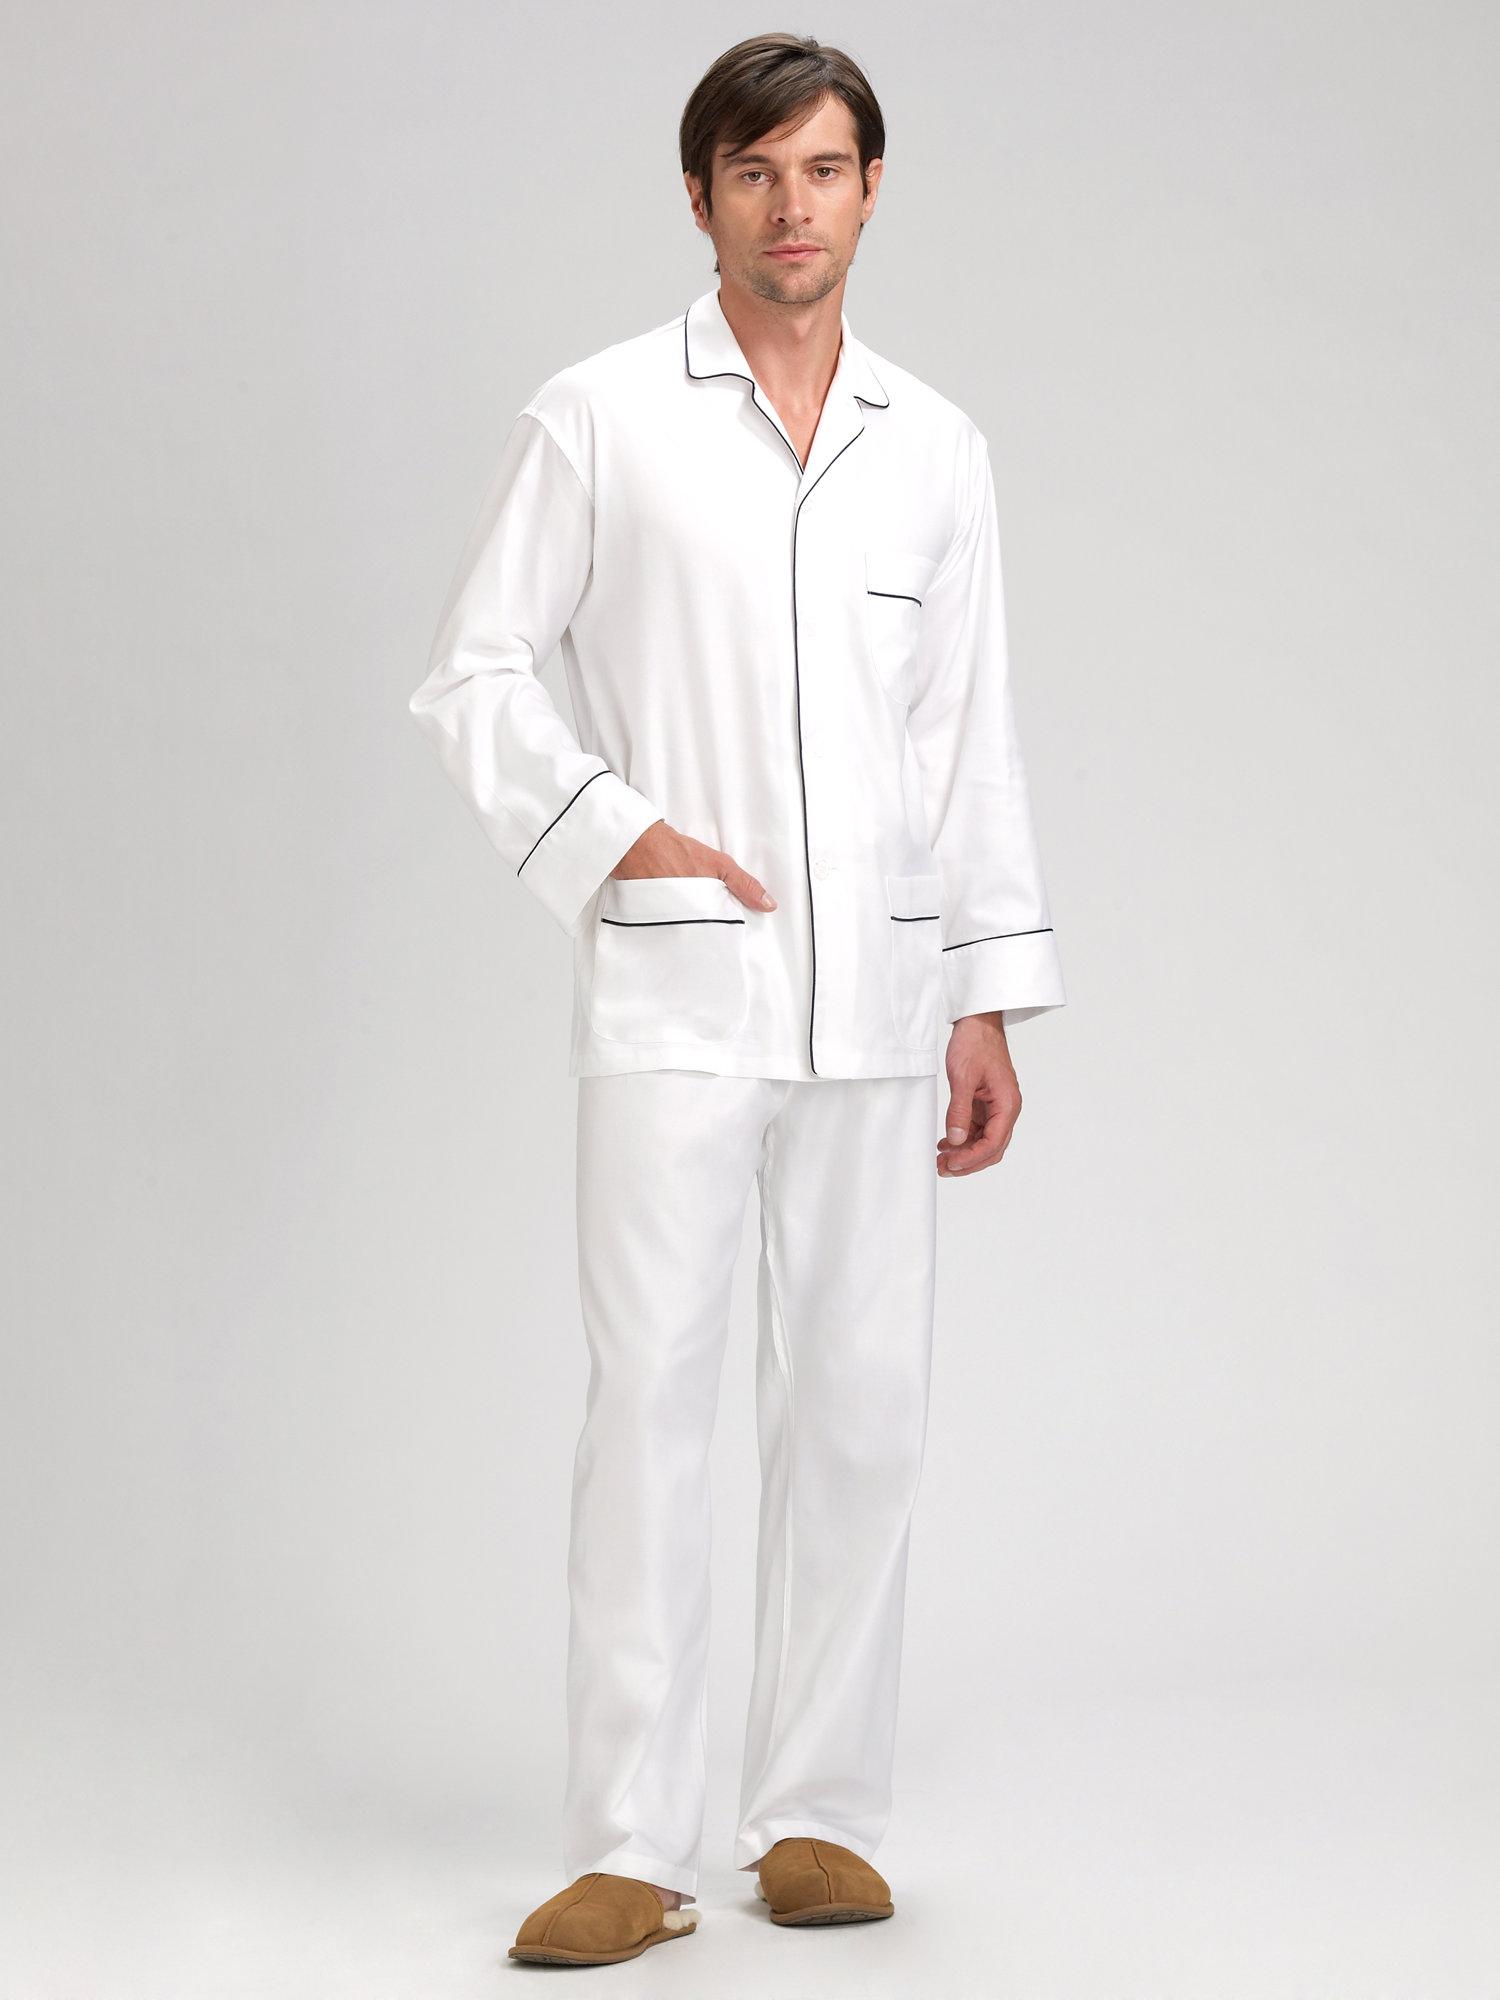 Lyst Saks Fifth Avenue Black Label Twill Cotton Pajama